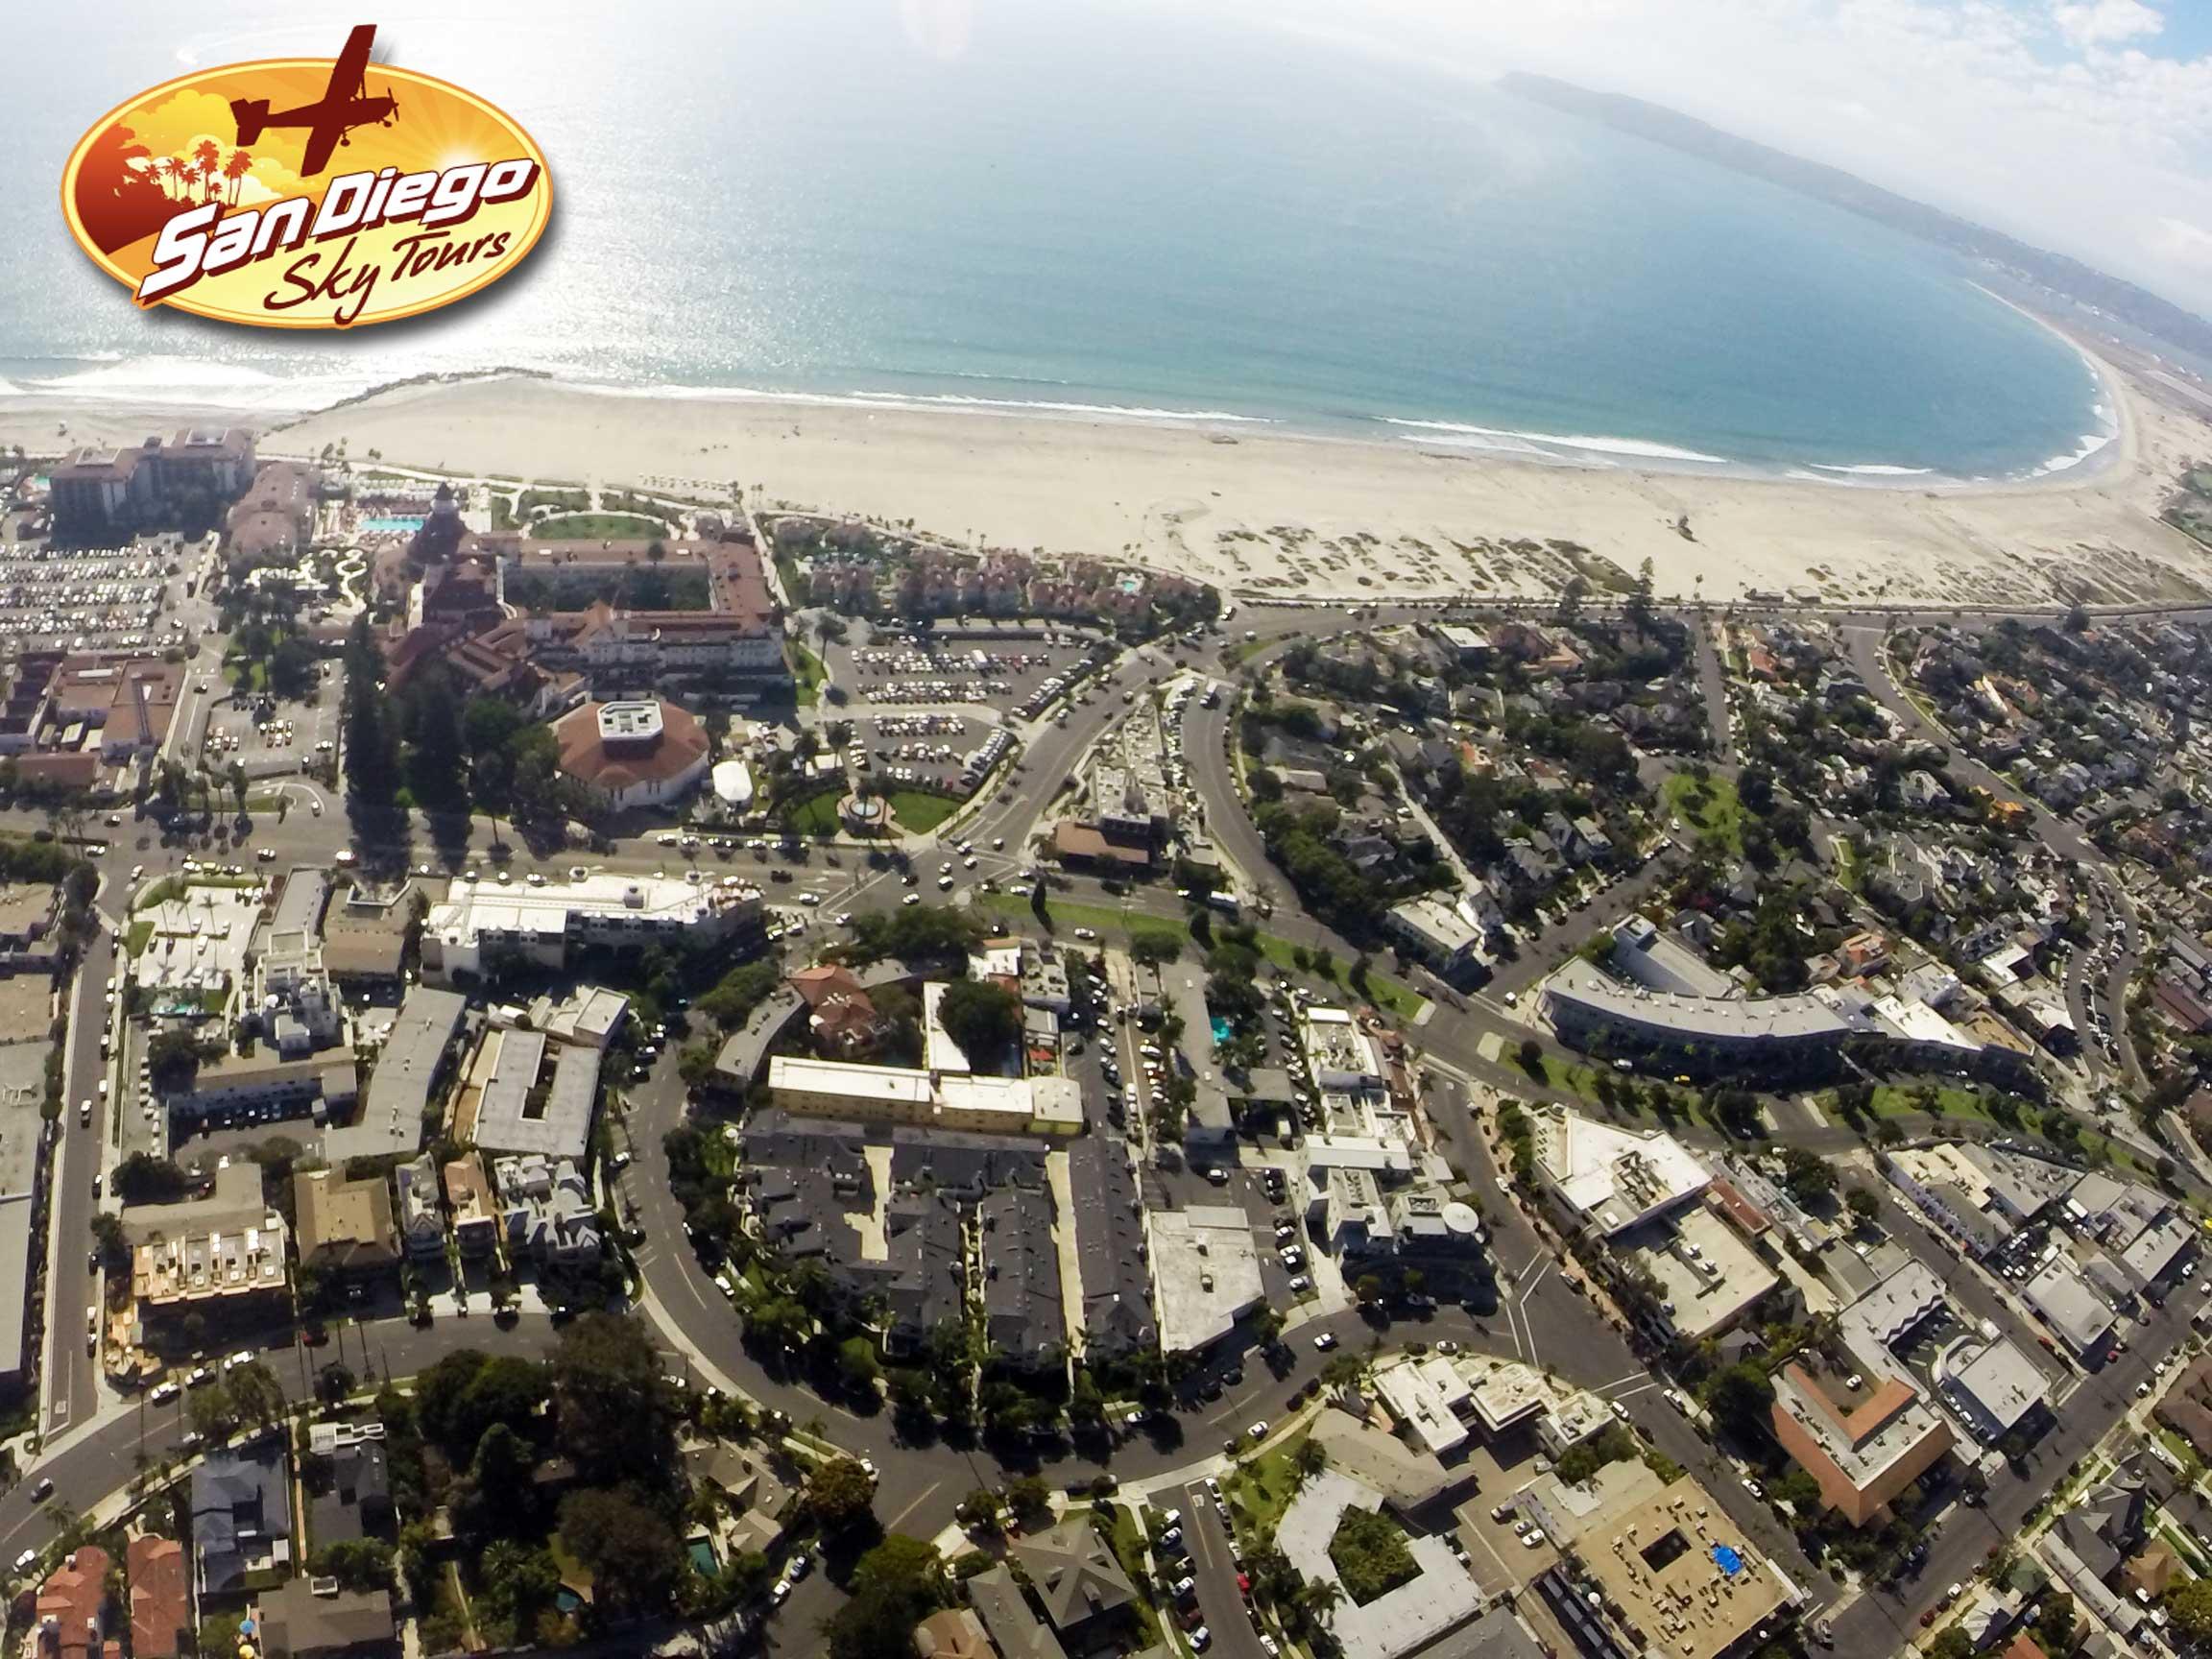 Hotel Del Coronado from above!